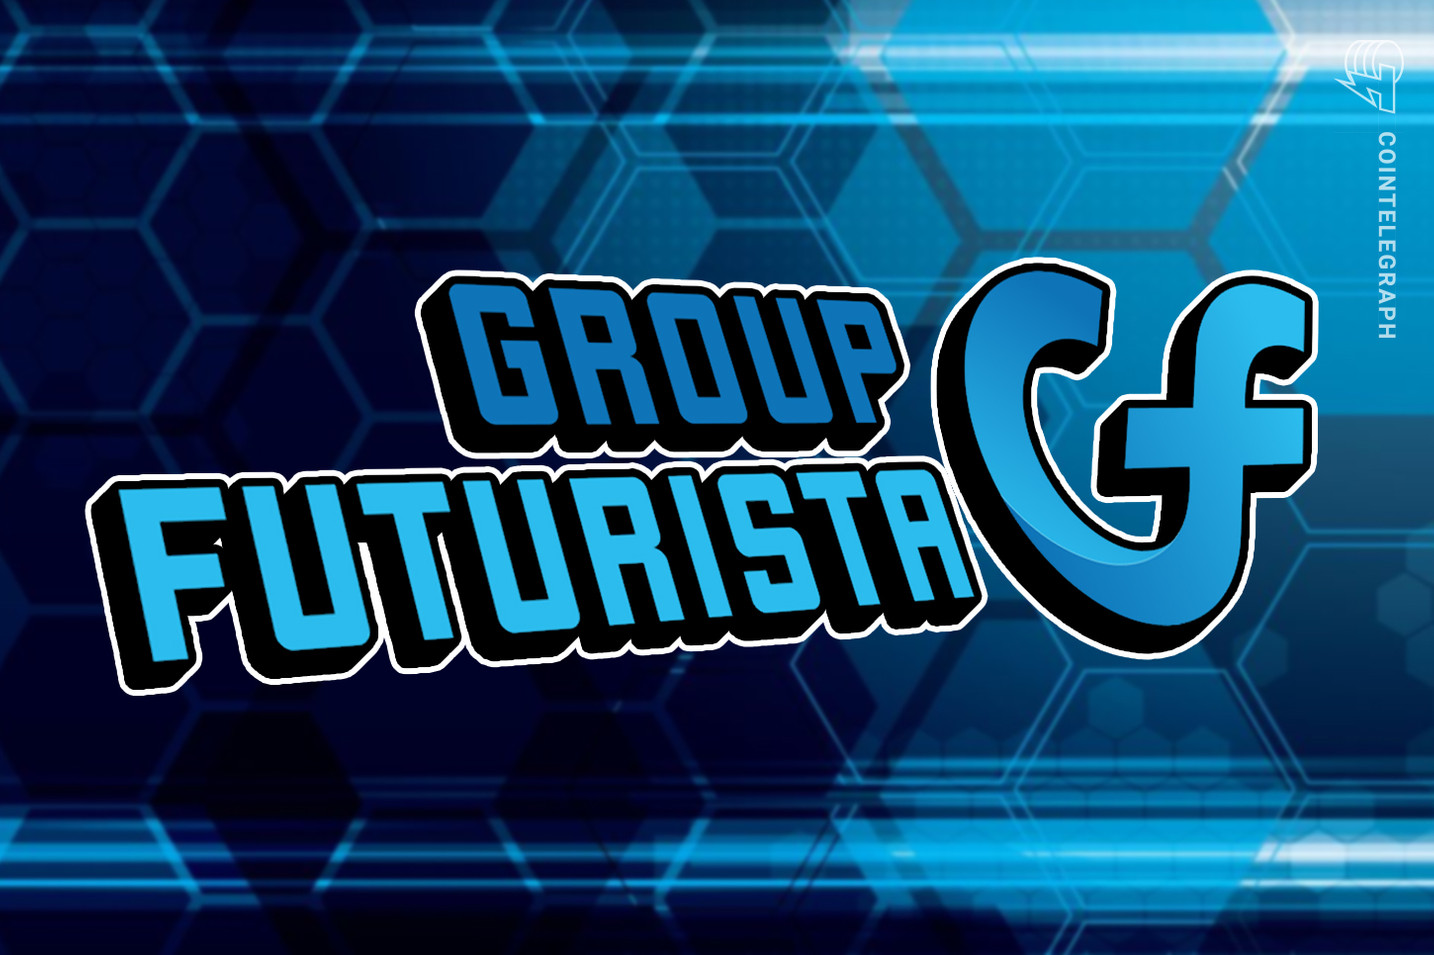 'Future of Digital SCM 3.0' by Group Futurista